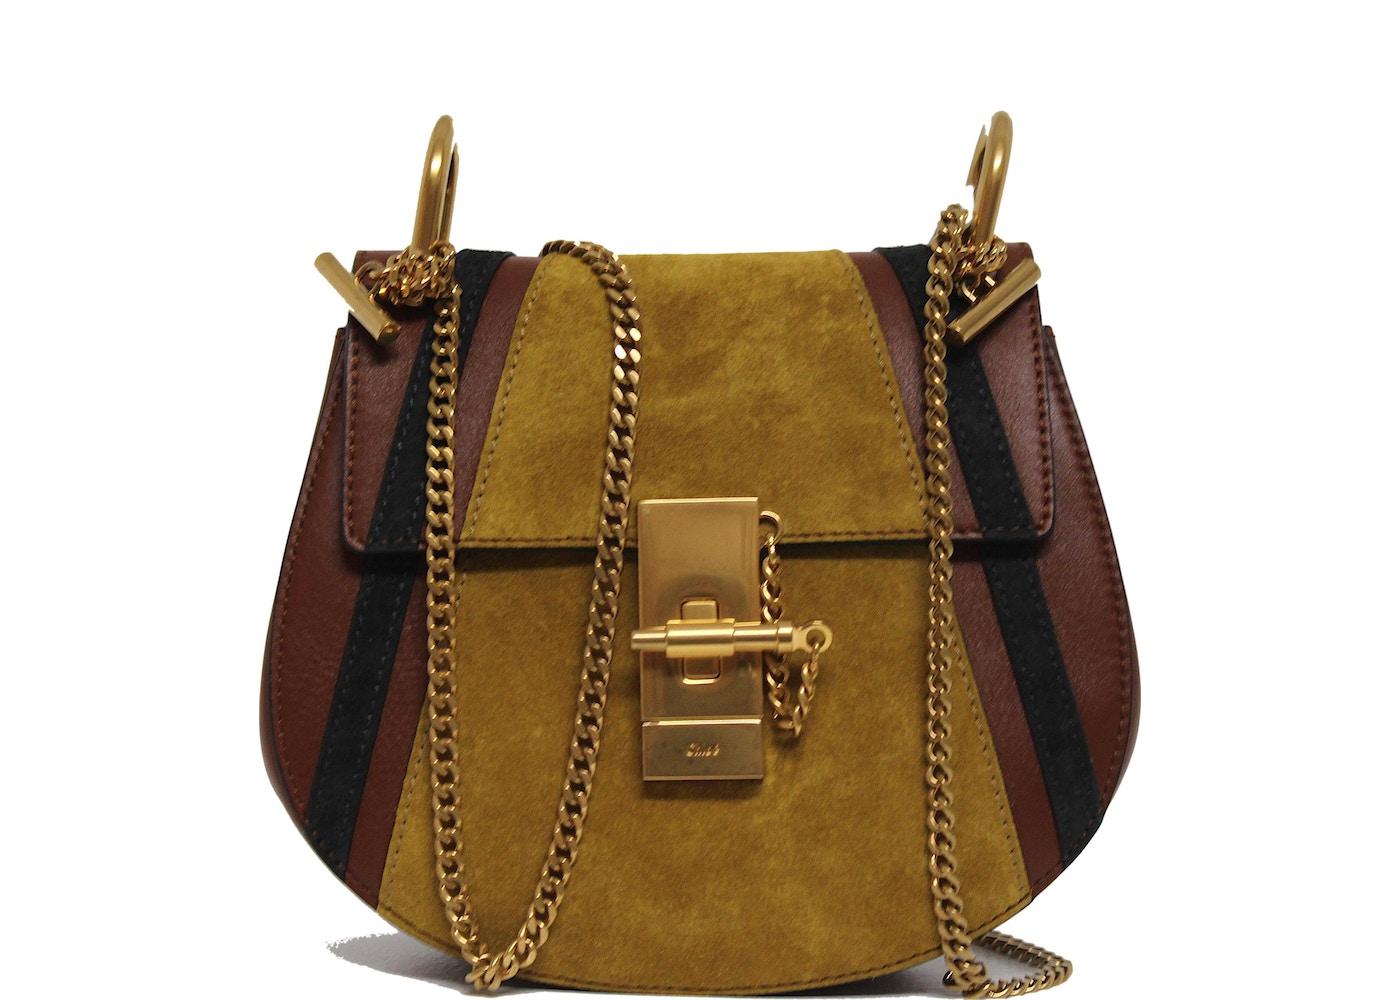 5696d3232236e Chloe Drew Shoulder Bag Patchwork Mini Brown Multicolor. Patchwork Mini  Brown Multicolor